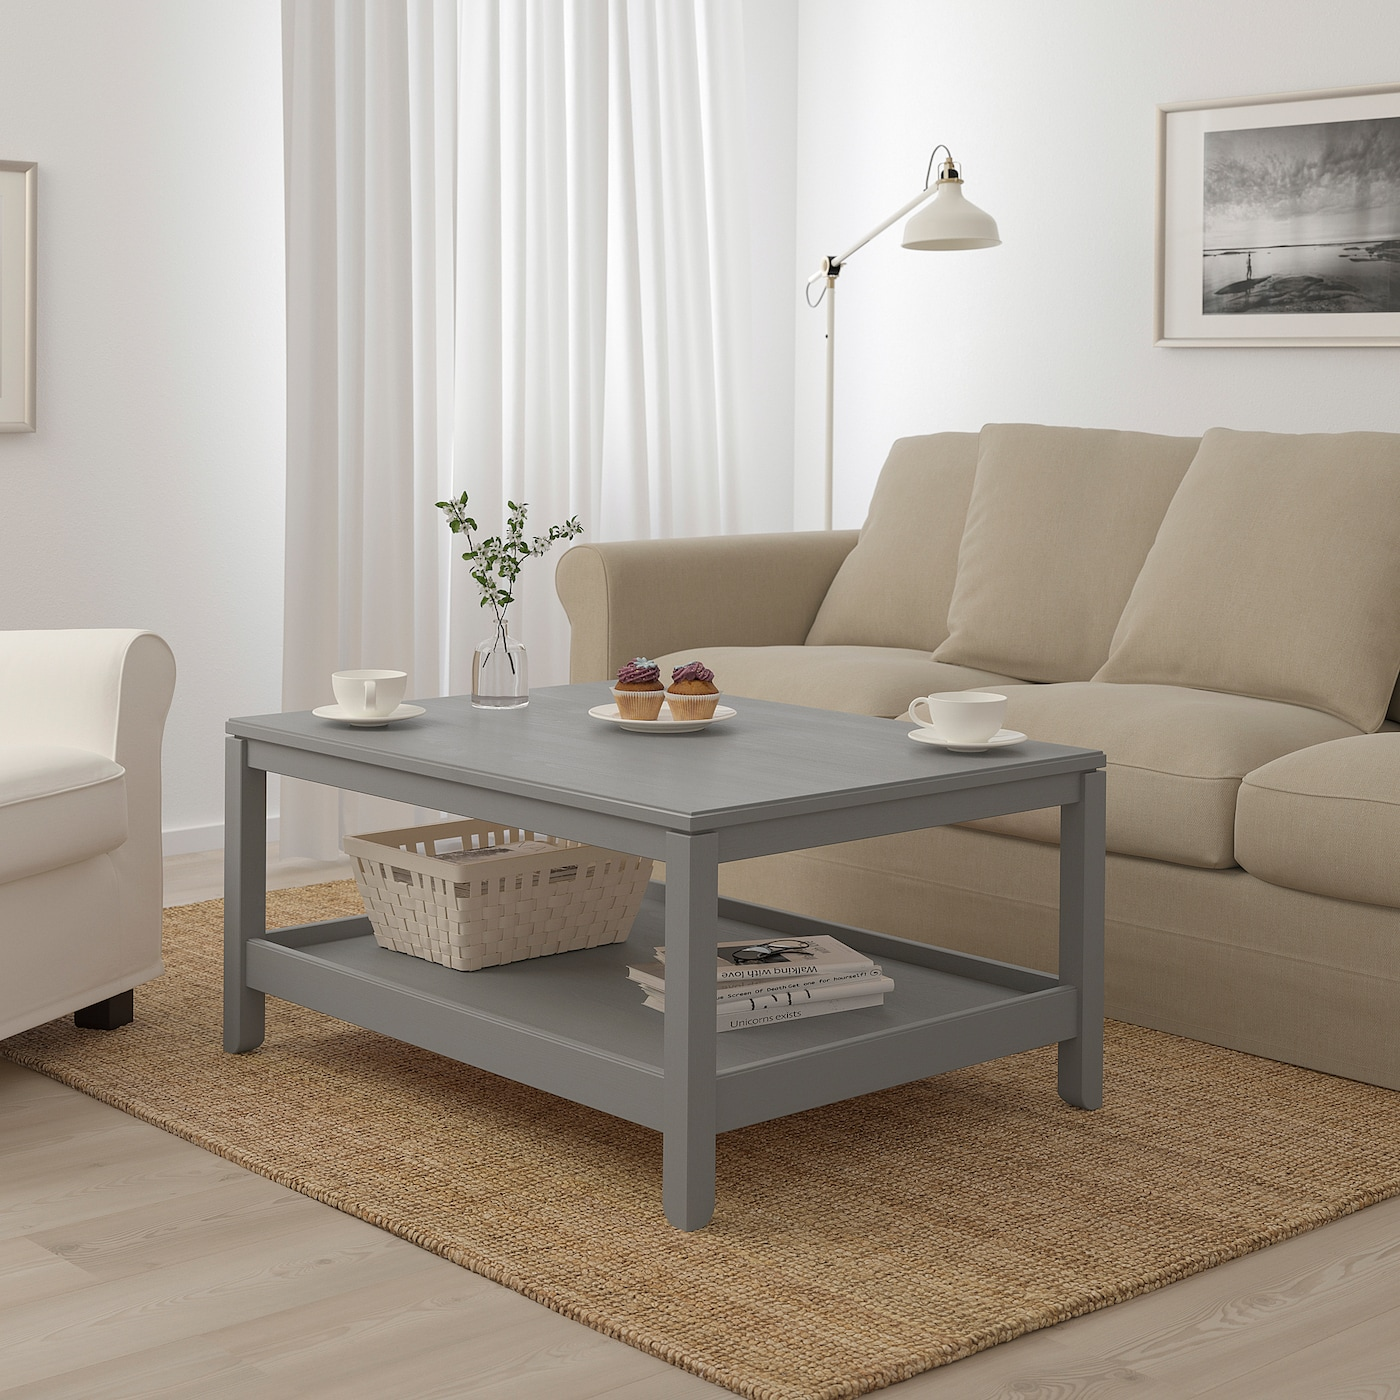 Havsta Coffee Table Grey 100x75 Cm Ikea Ireland [ 1400 x 1400 Pixel ]